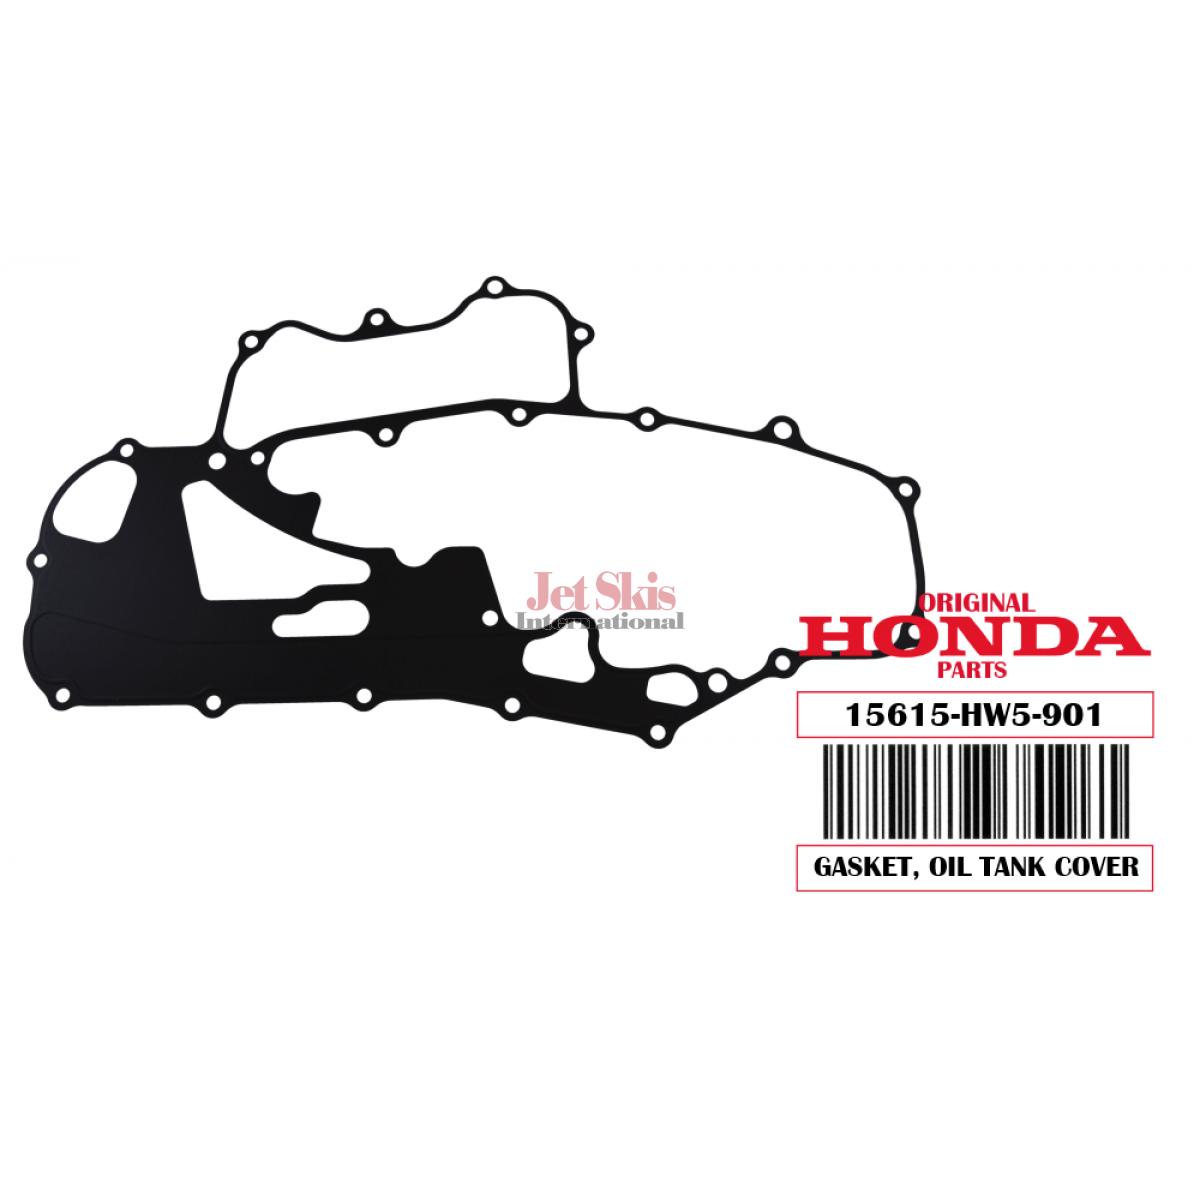 HONDA AQUATRAX OIL TANK COVER GASKET F15/F15X 2008-2009